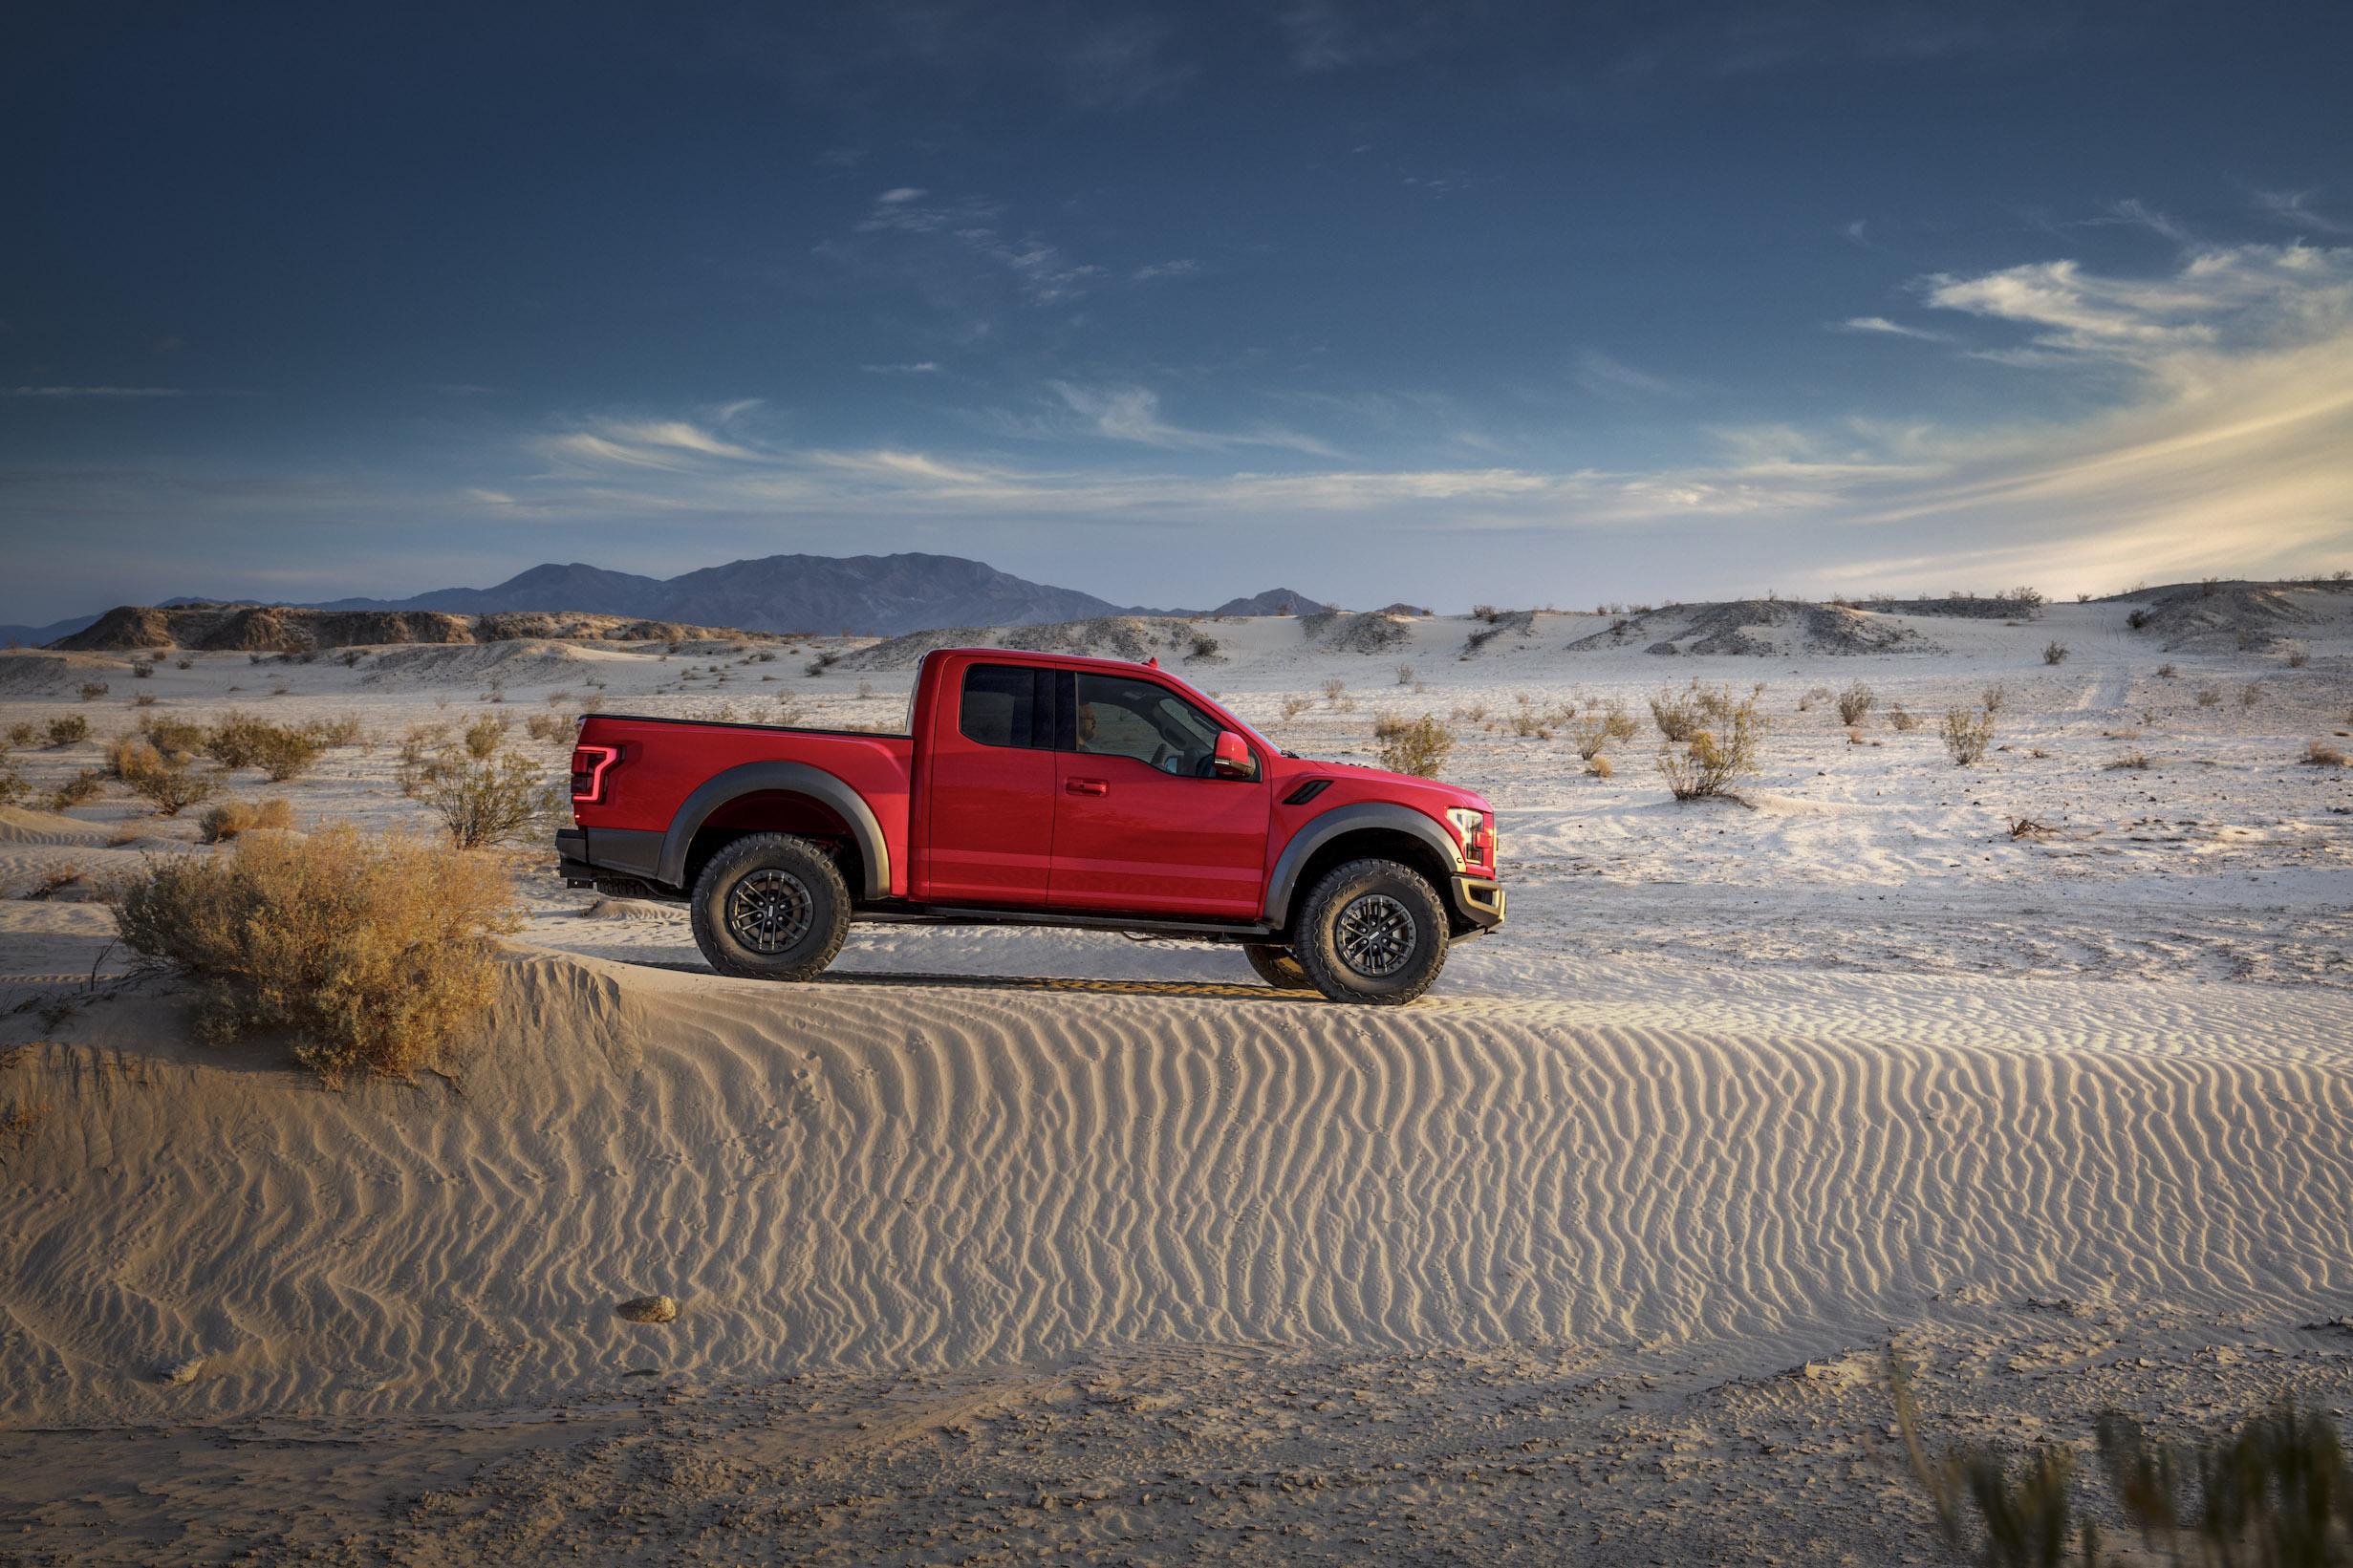 2019 Ford F-150 Raptor Sand Dunes Stationary